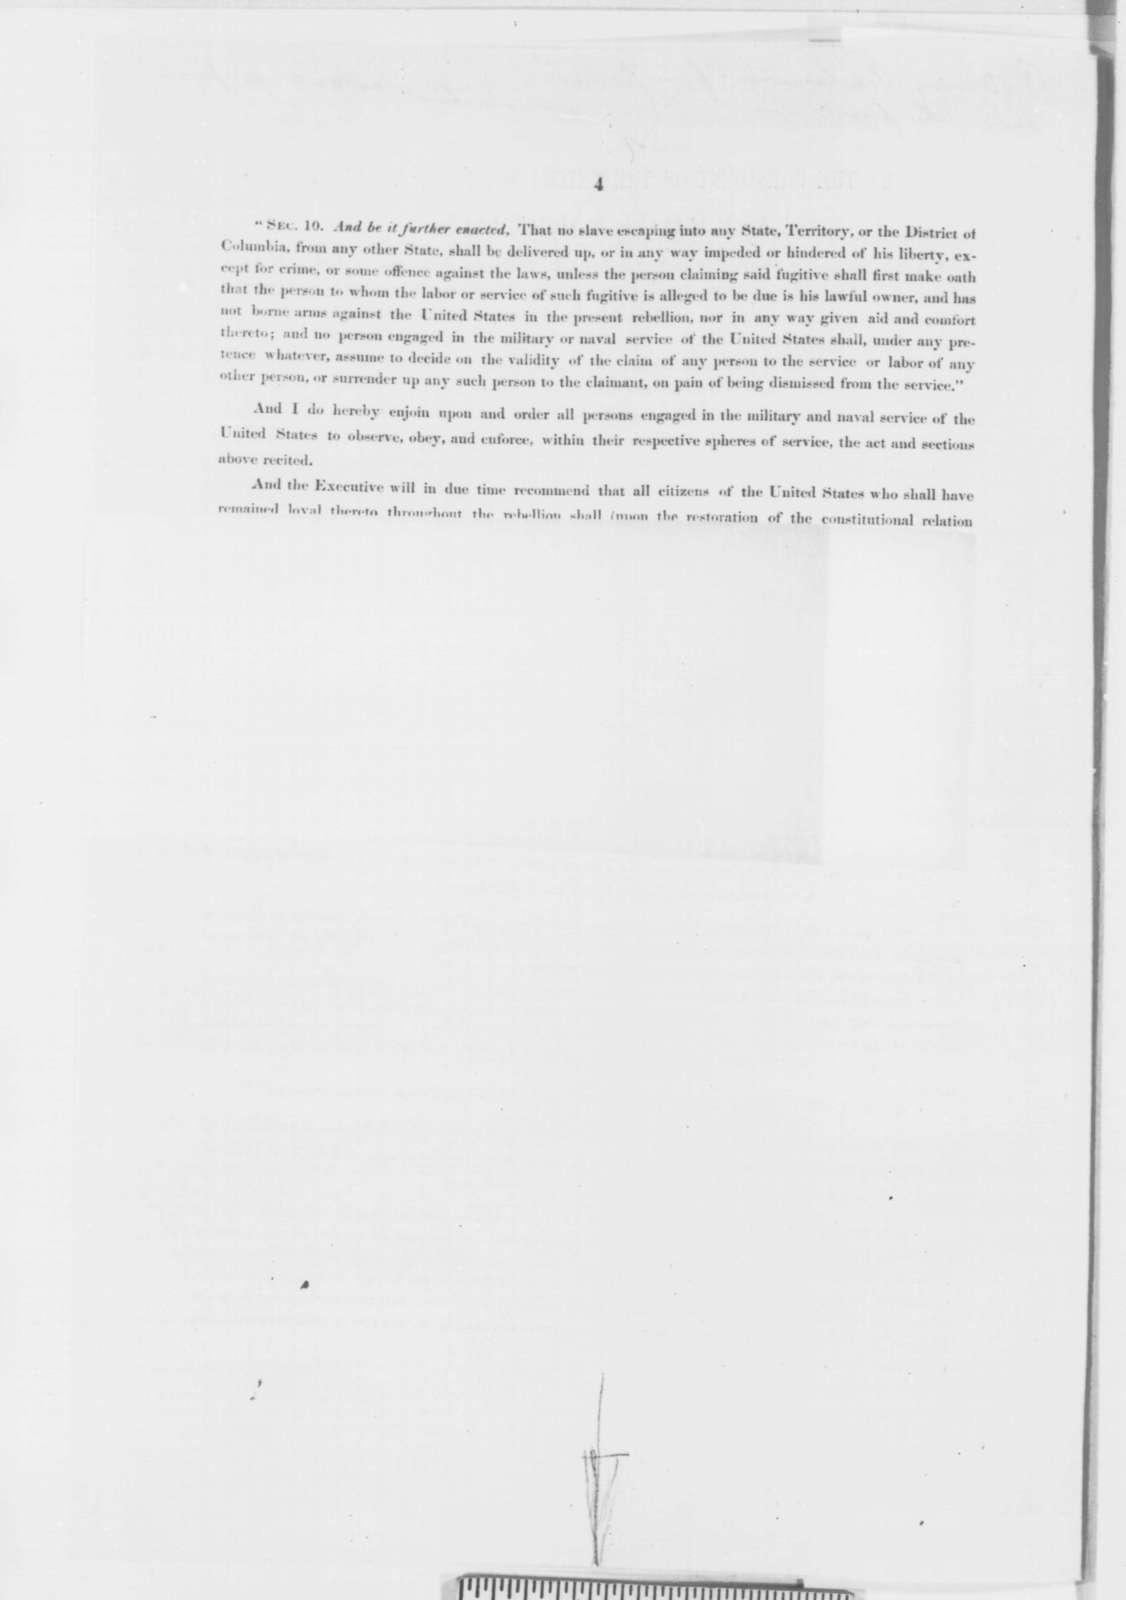 Abraham Lincoln, Monday, September 22, 1862  (Preliminary Emancipation Proclamation)